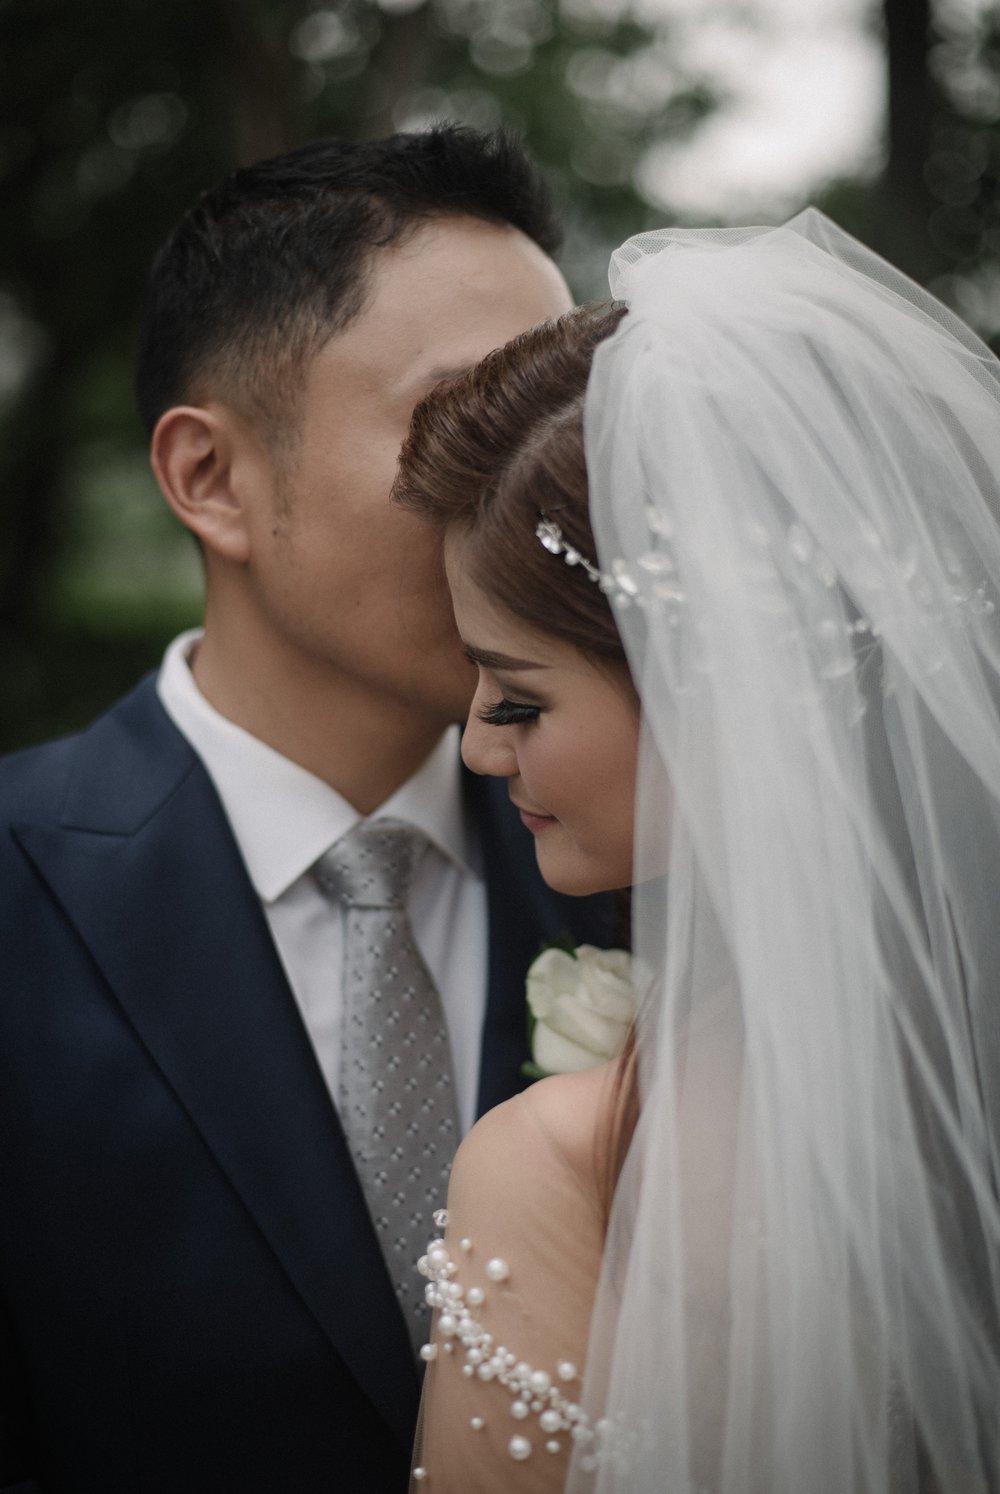 livia-reagan-wedding-raffles-jakarta-pyara-photo-gejoo 28.jpg